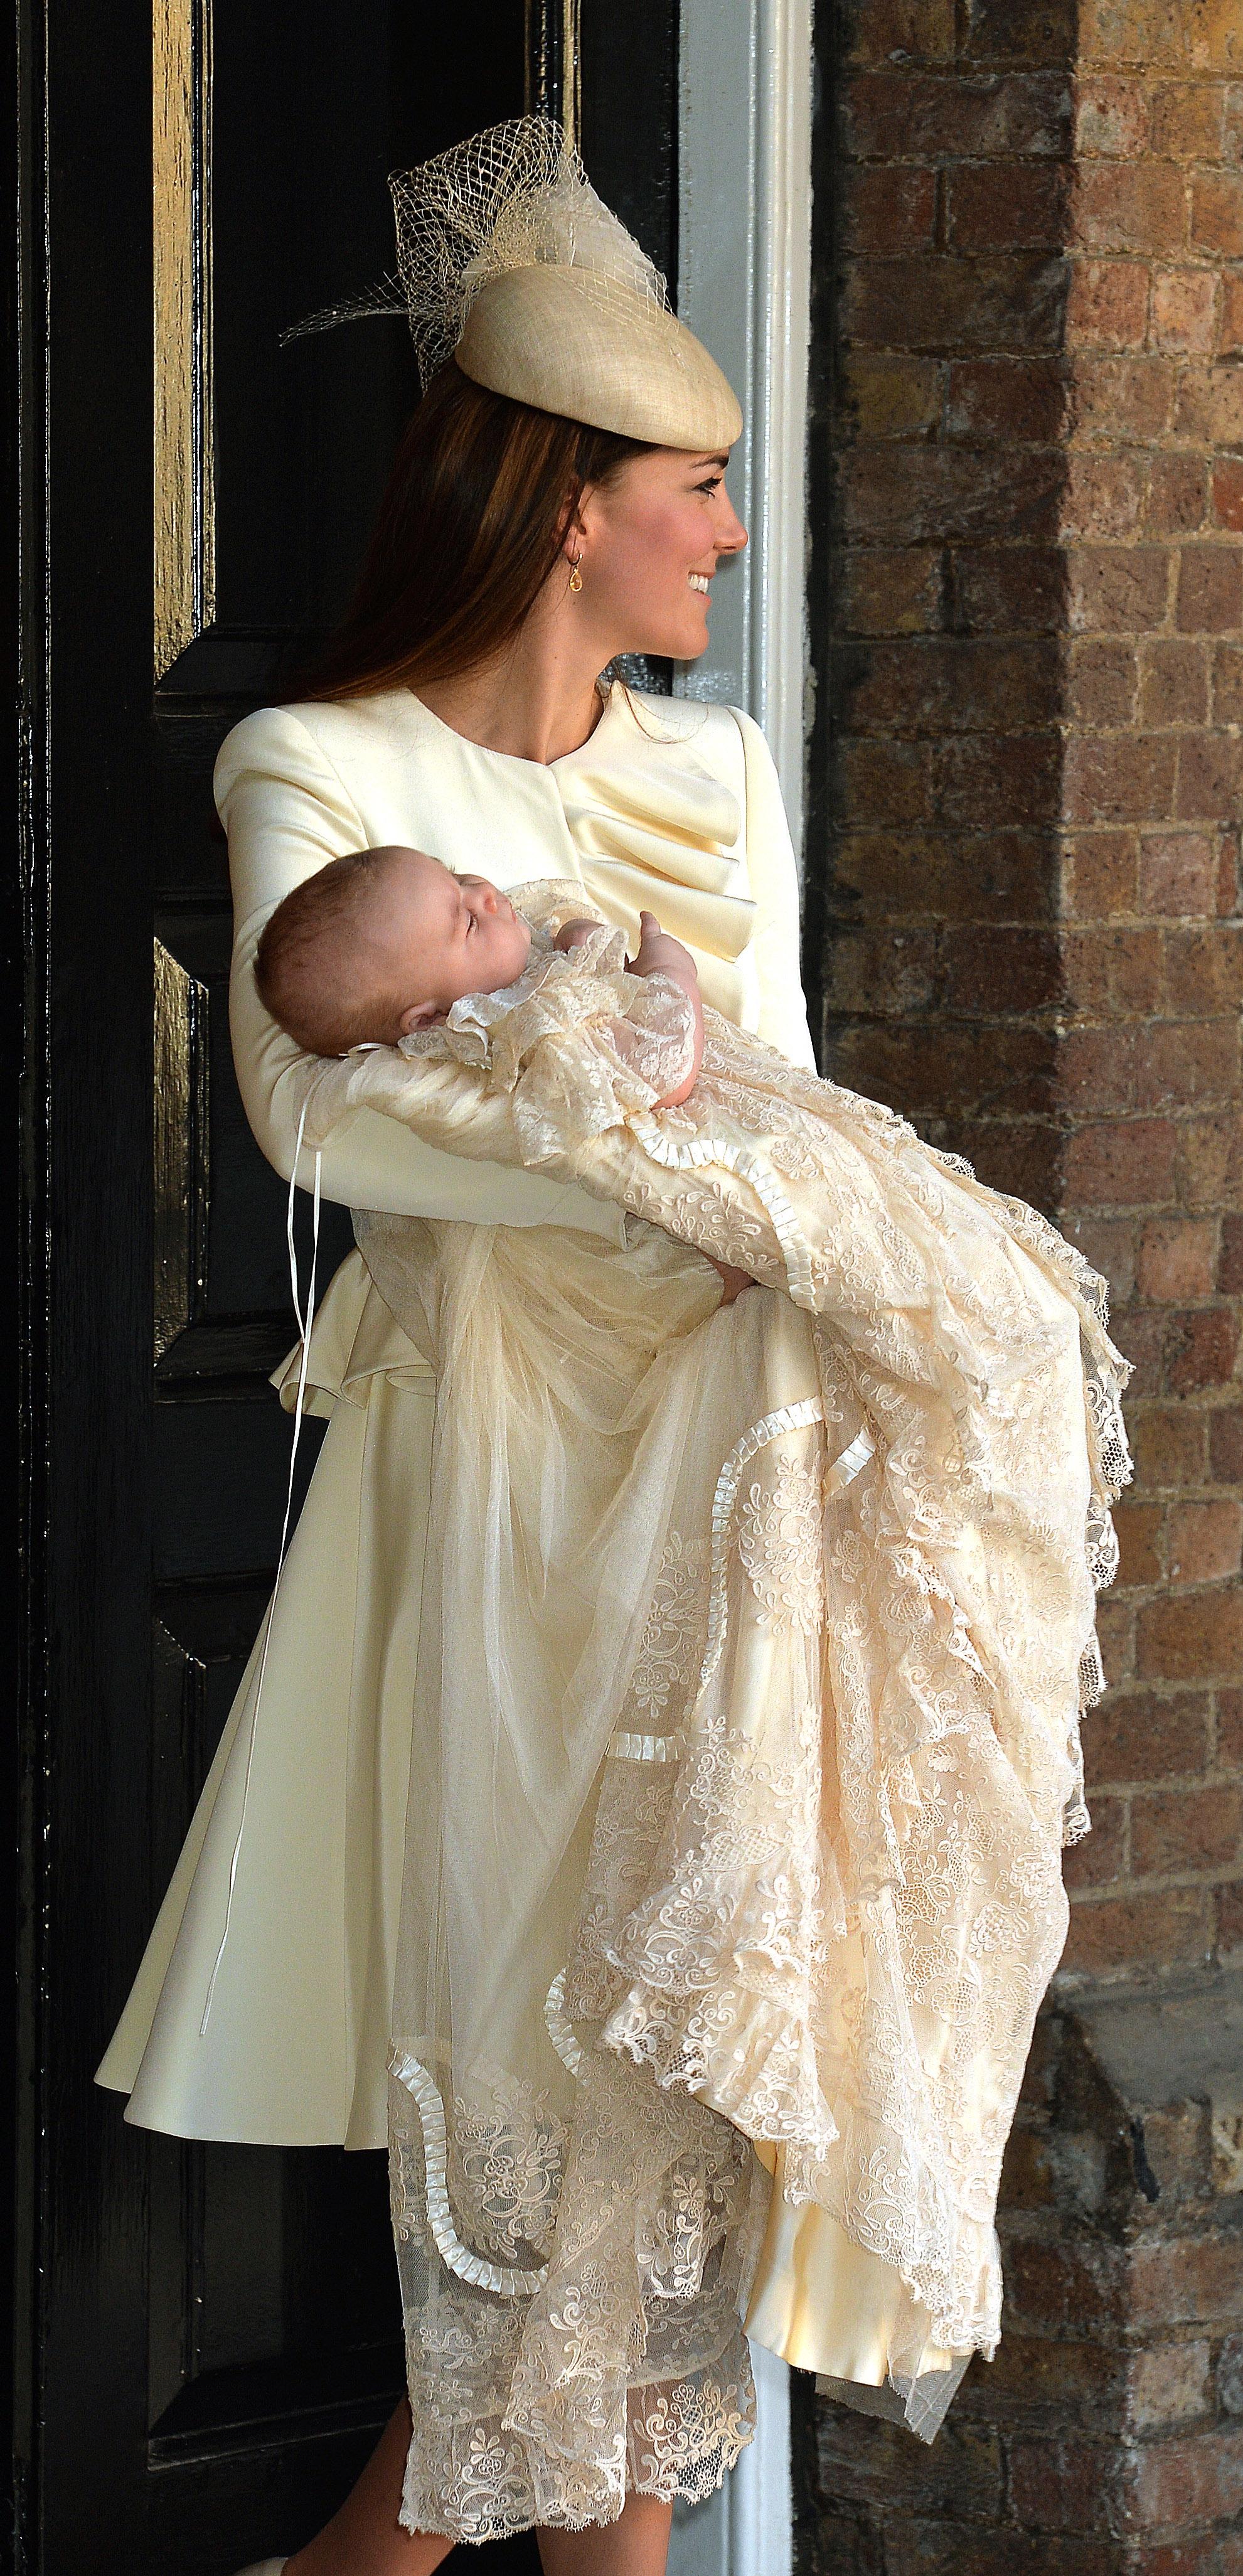 Batizado Príncipe George